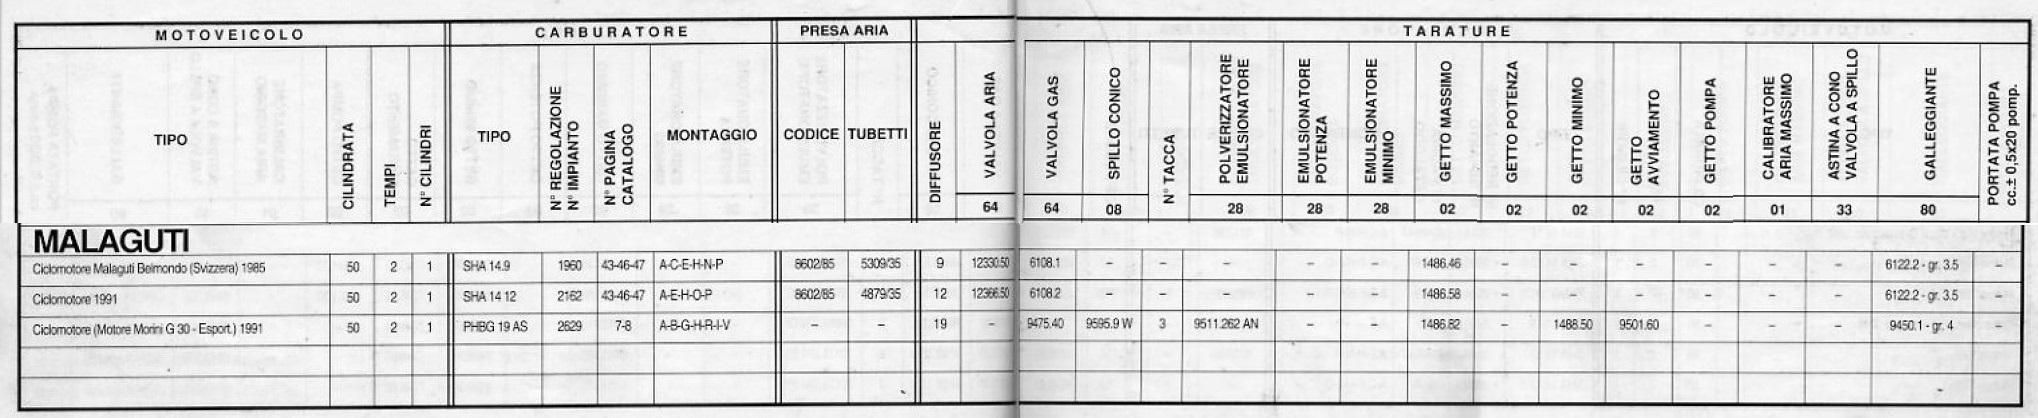 réglage de base dellorto phbg 19 pour un moteur franco morini turbostar 72 2021-023